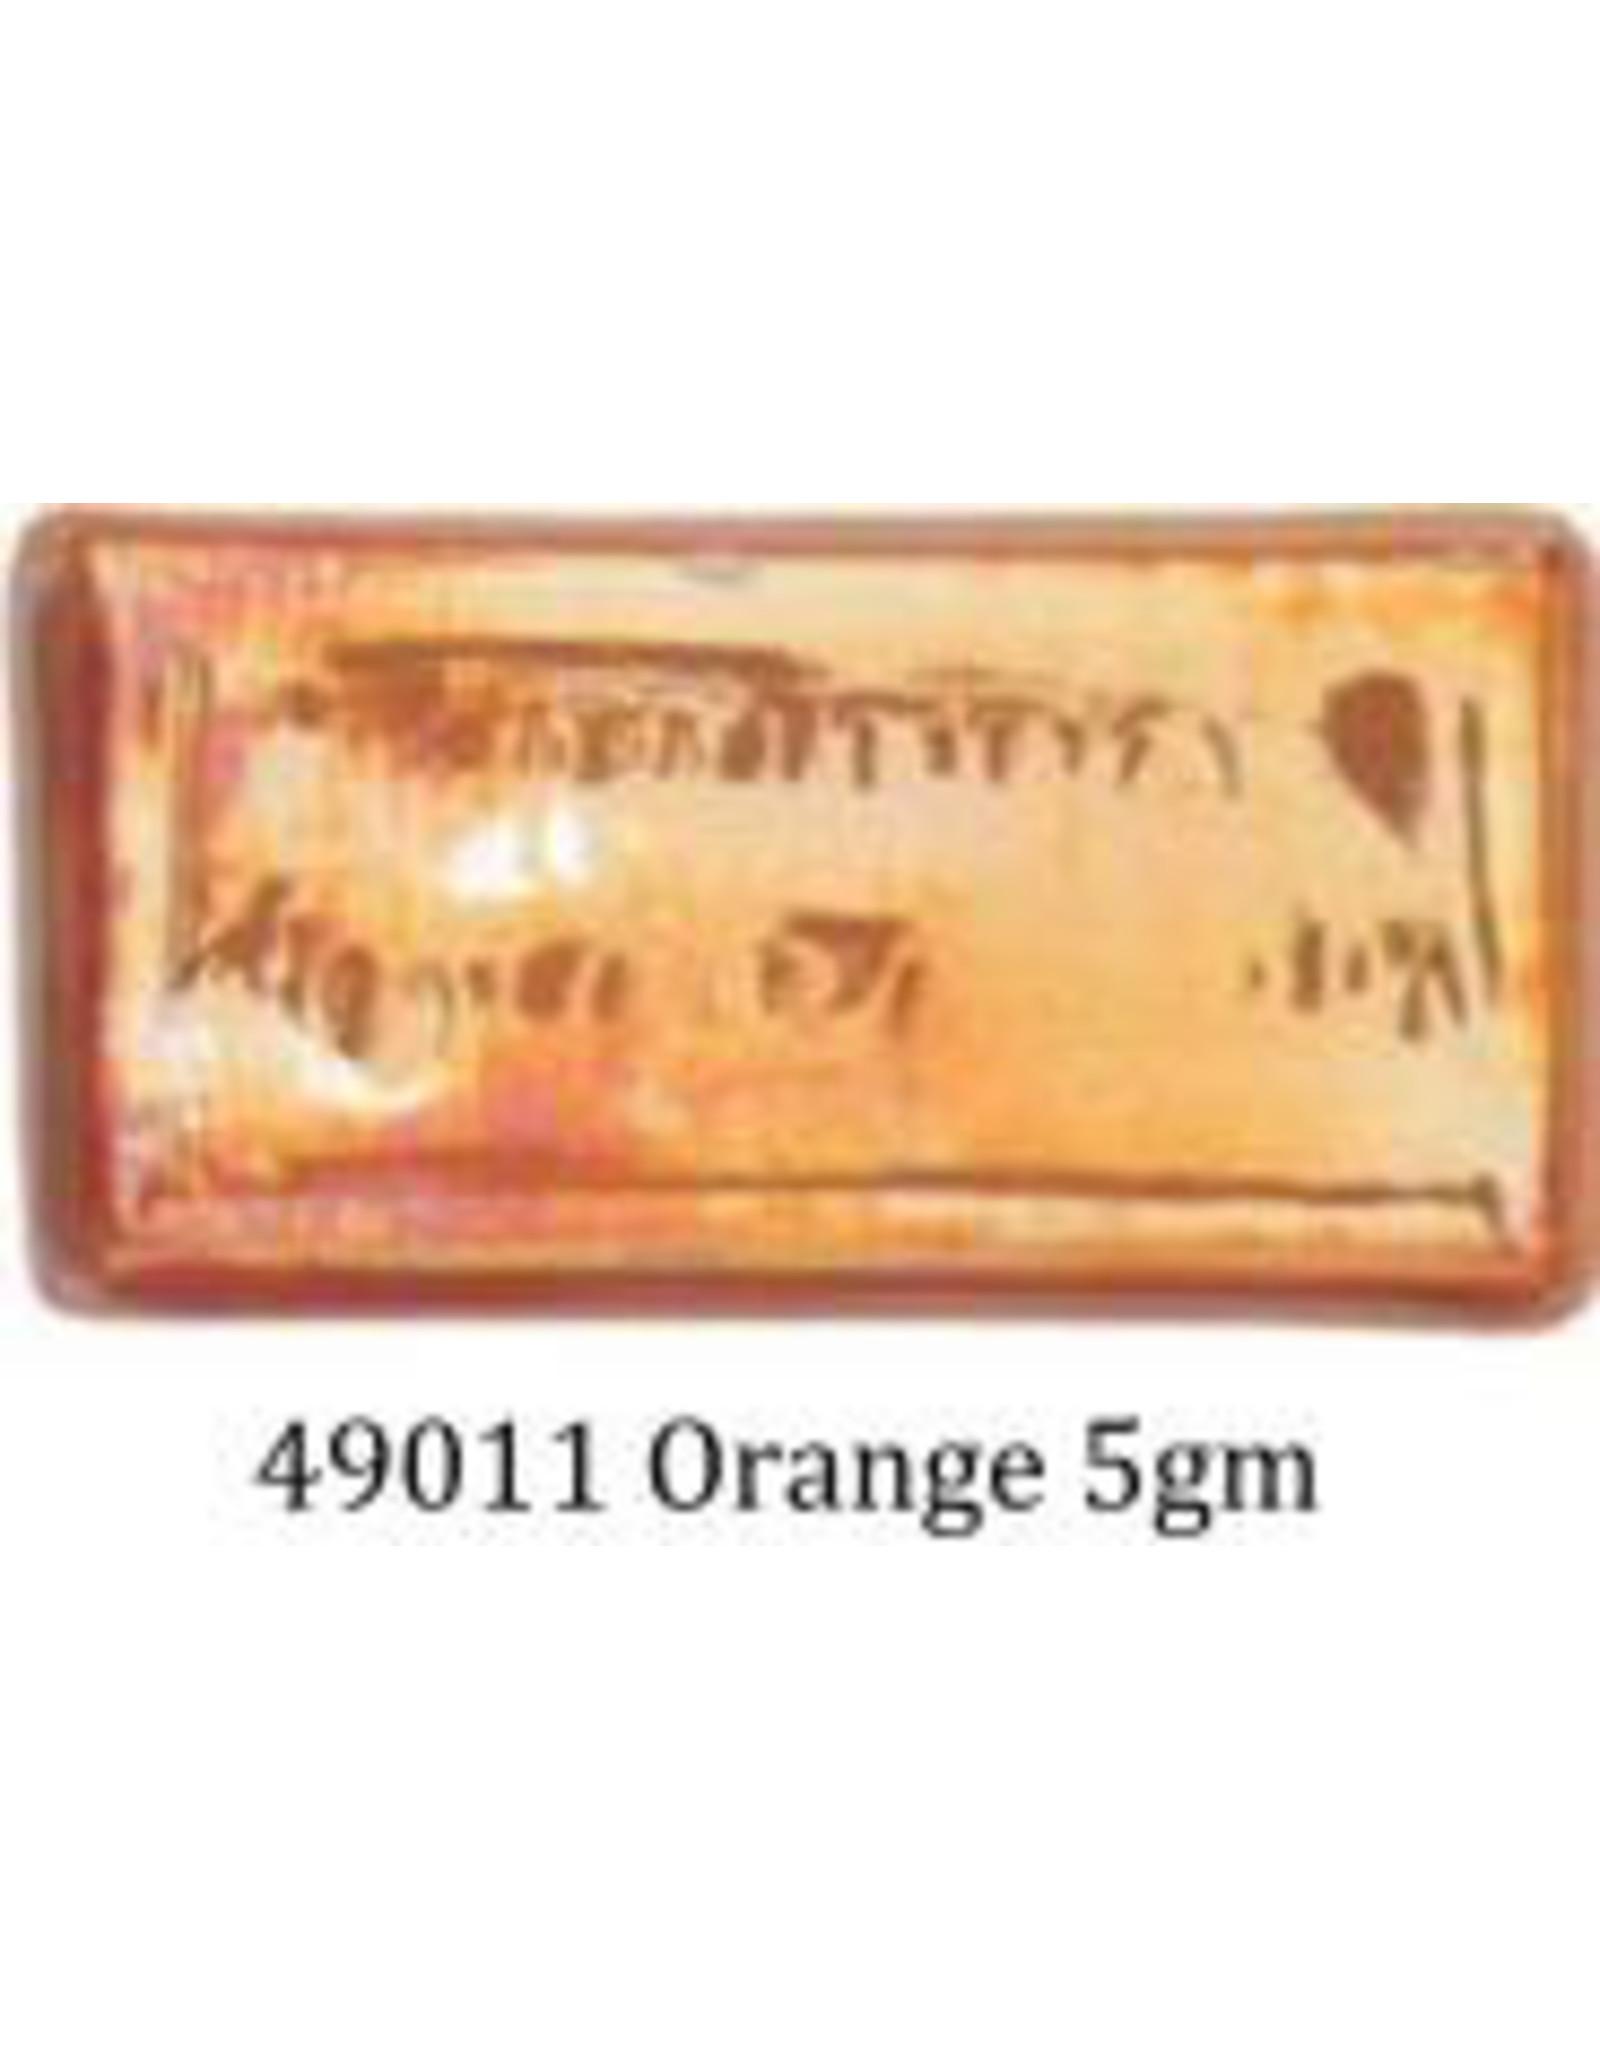 Potclays Colorobbia Orange Lustre - 5g